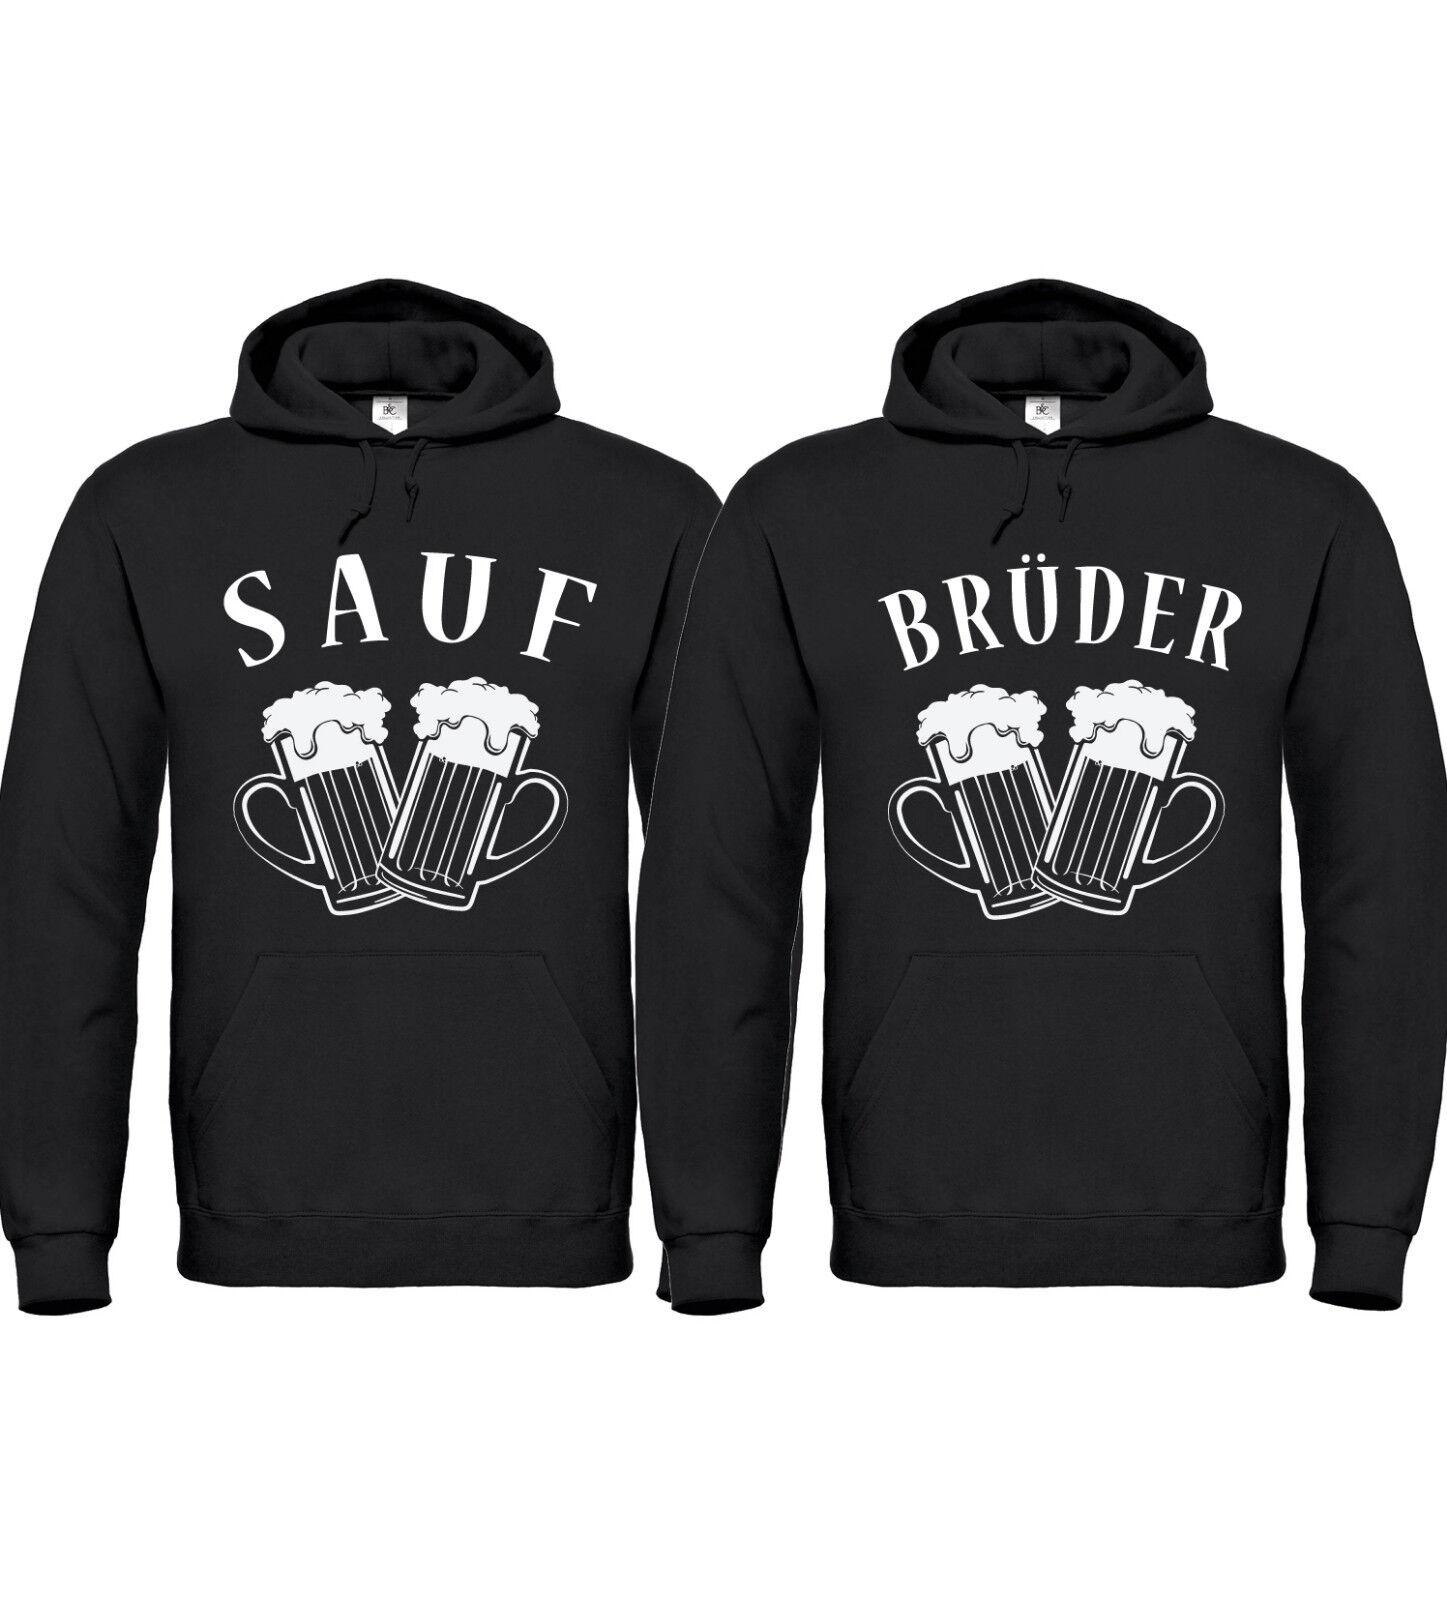 SAUFBRÜDER - Partner Hoodies - Friends Freunde Brüder Bier Alkohol Saufen Party